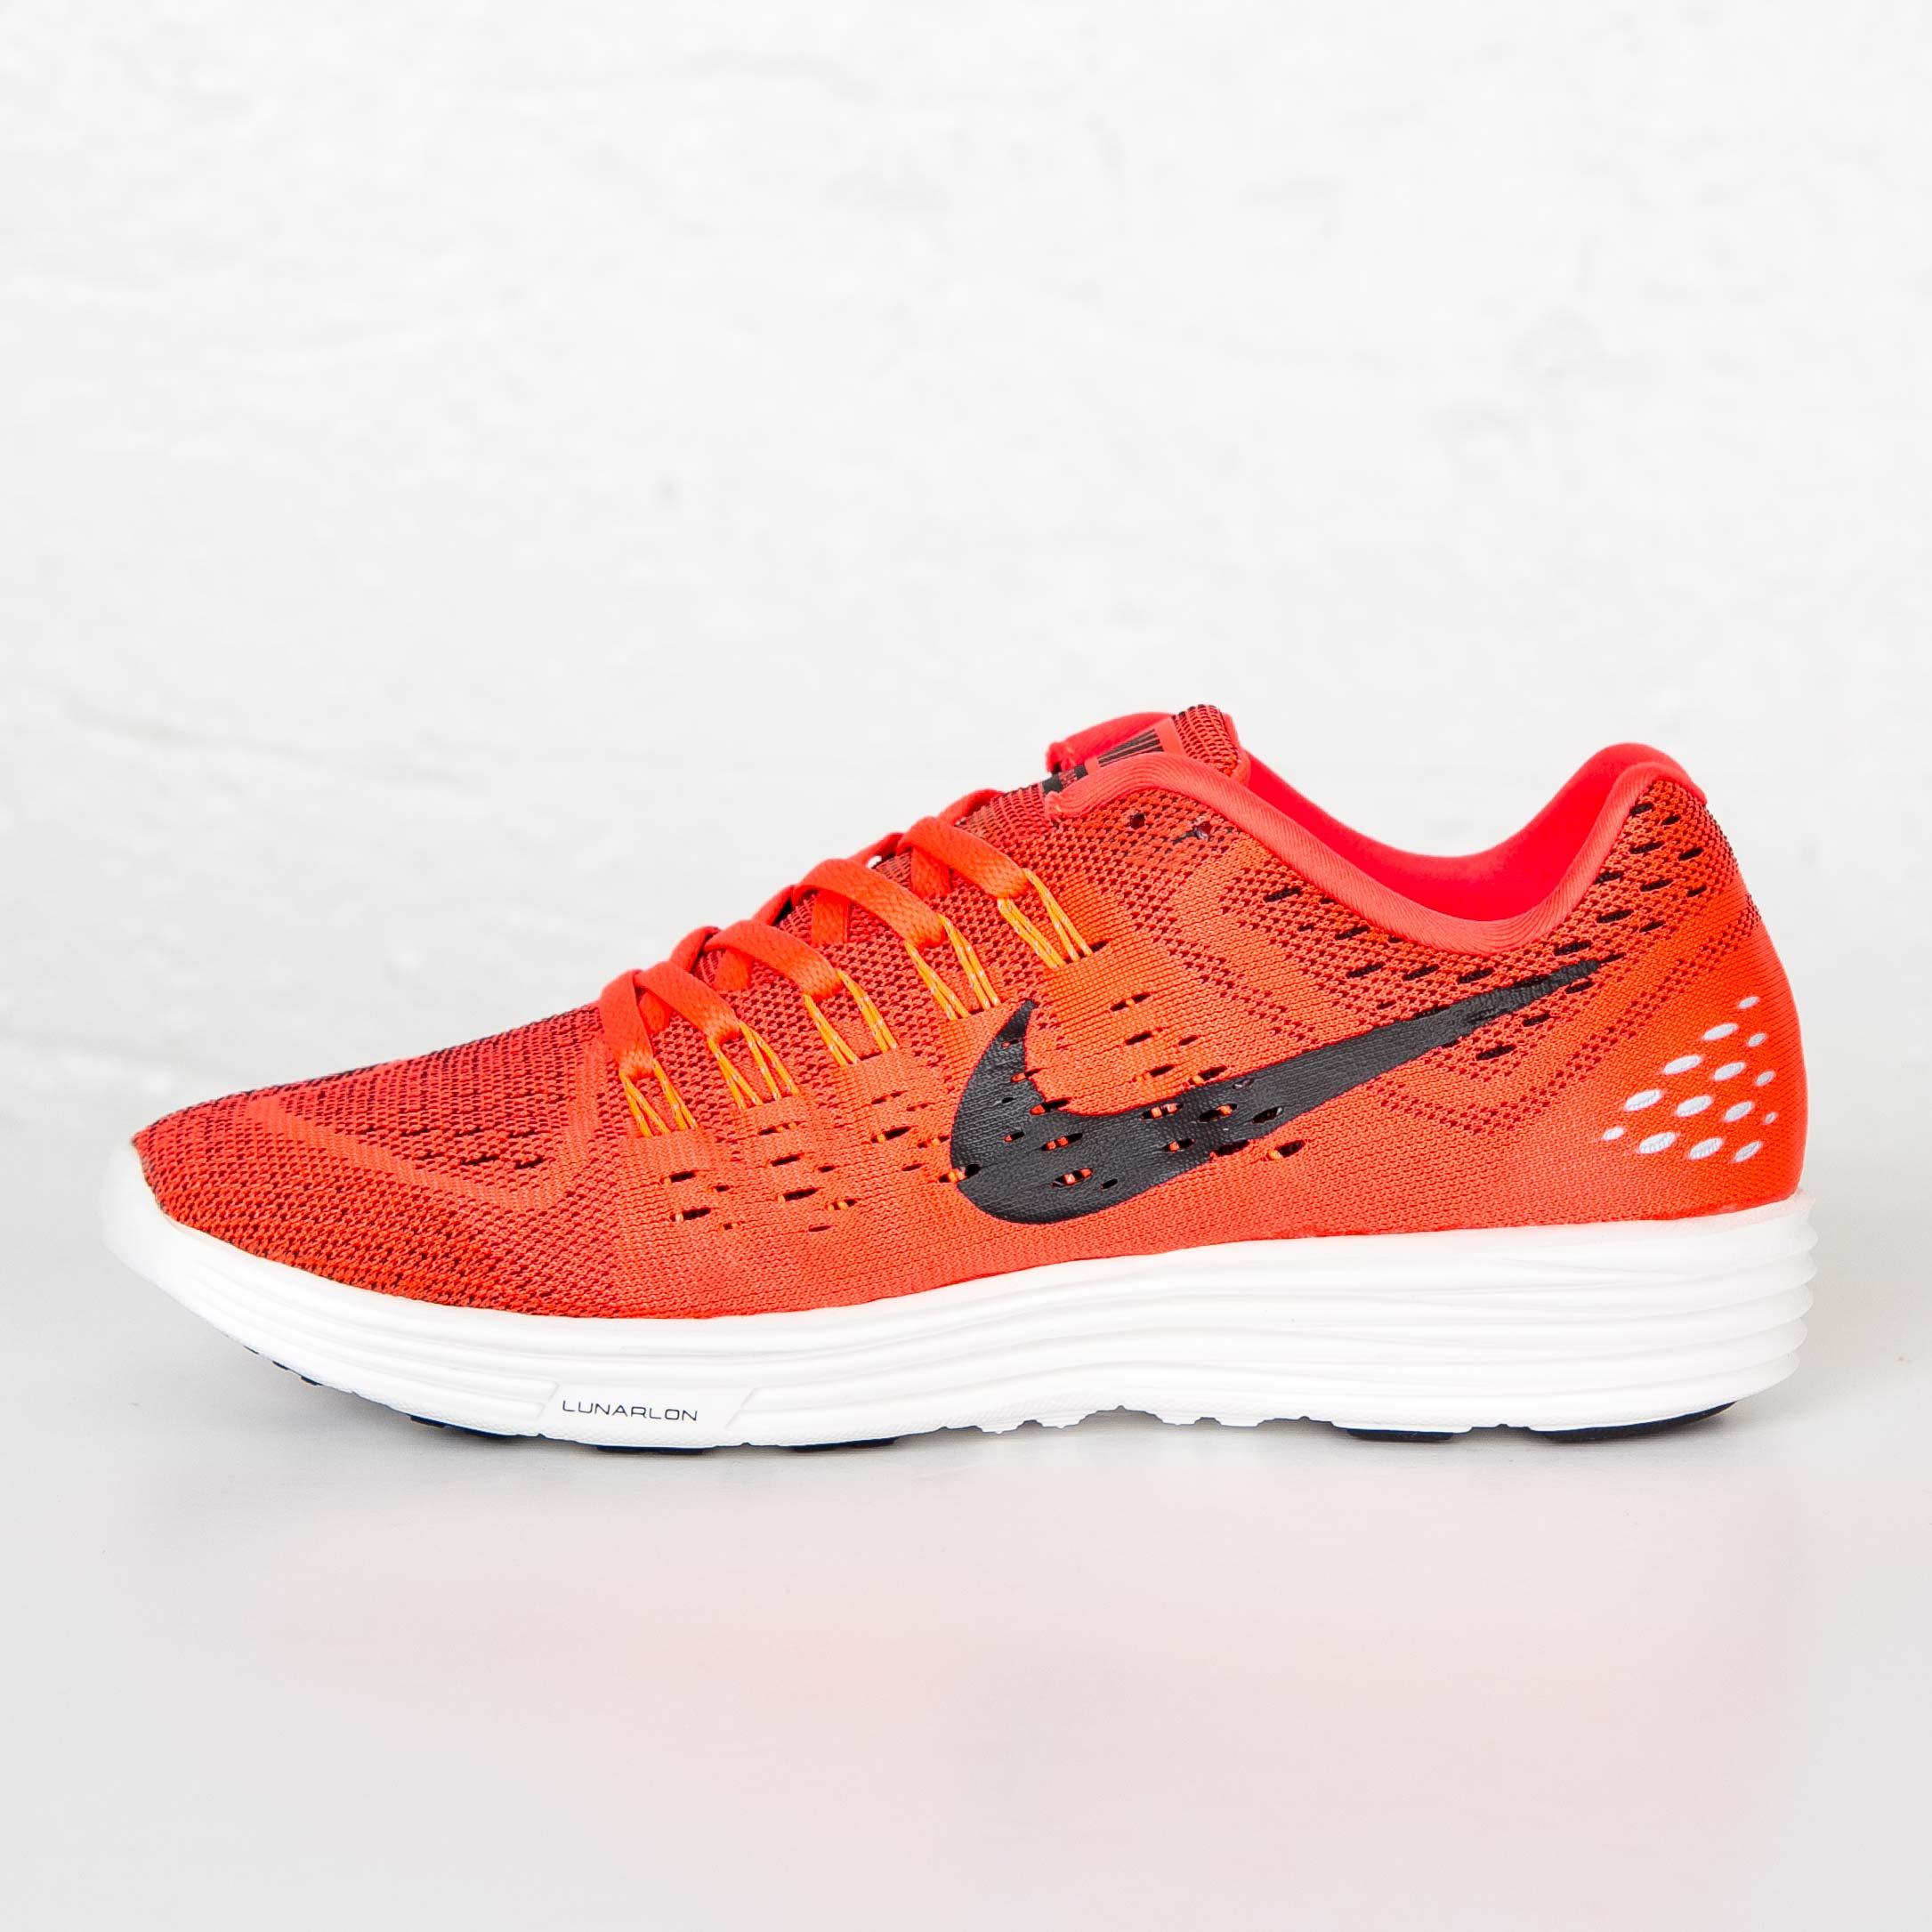 Nike Lunartempo Nike Lunartempo Nike Lunartempo Nike Lunartempo Nike  Lunartempo 7435823505